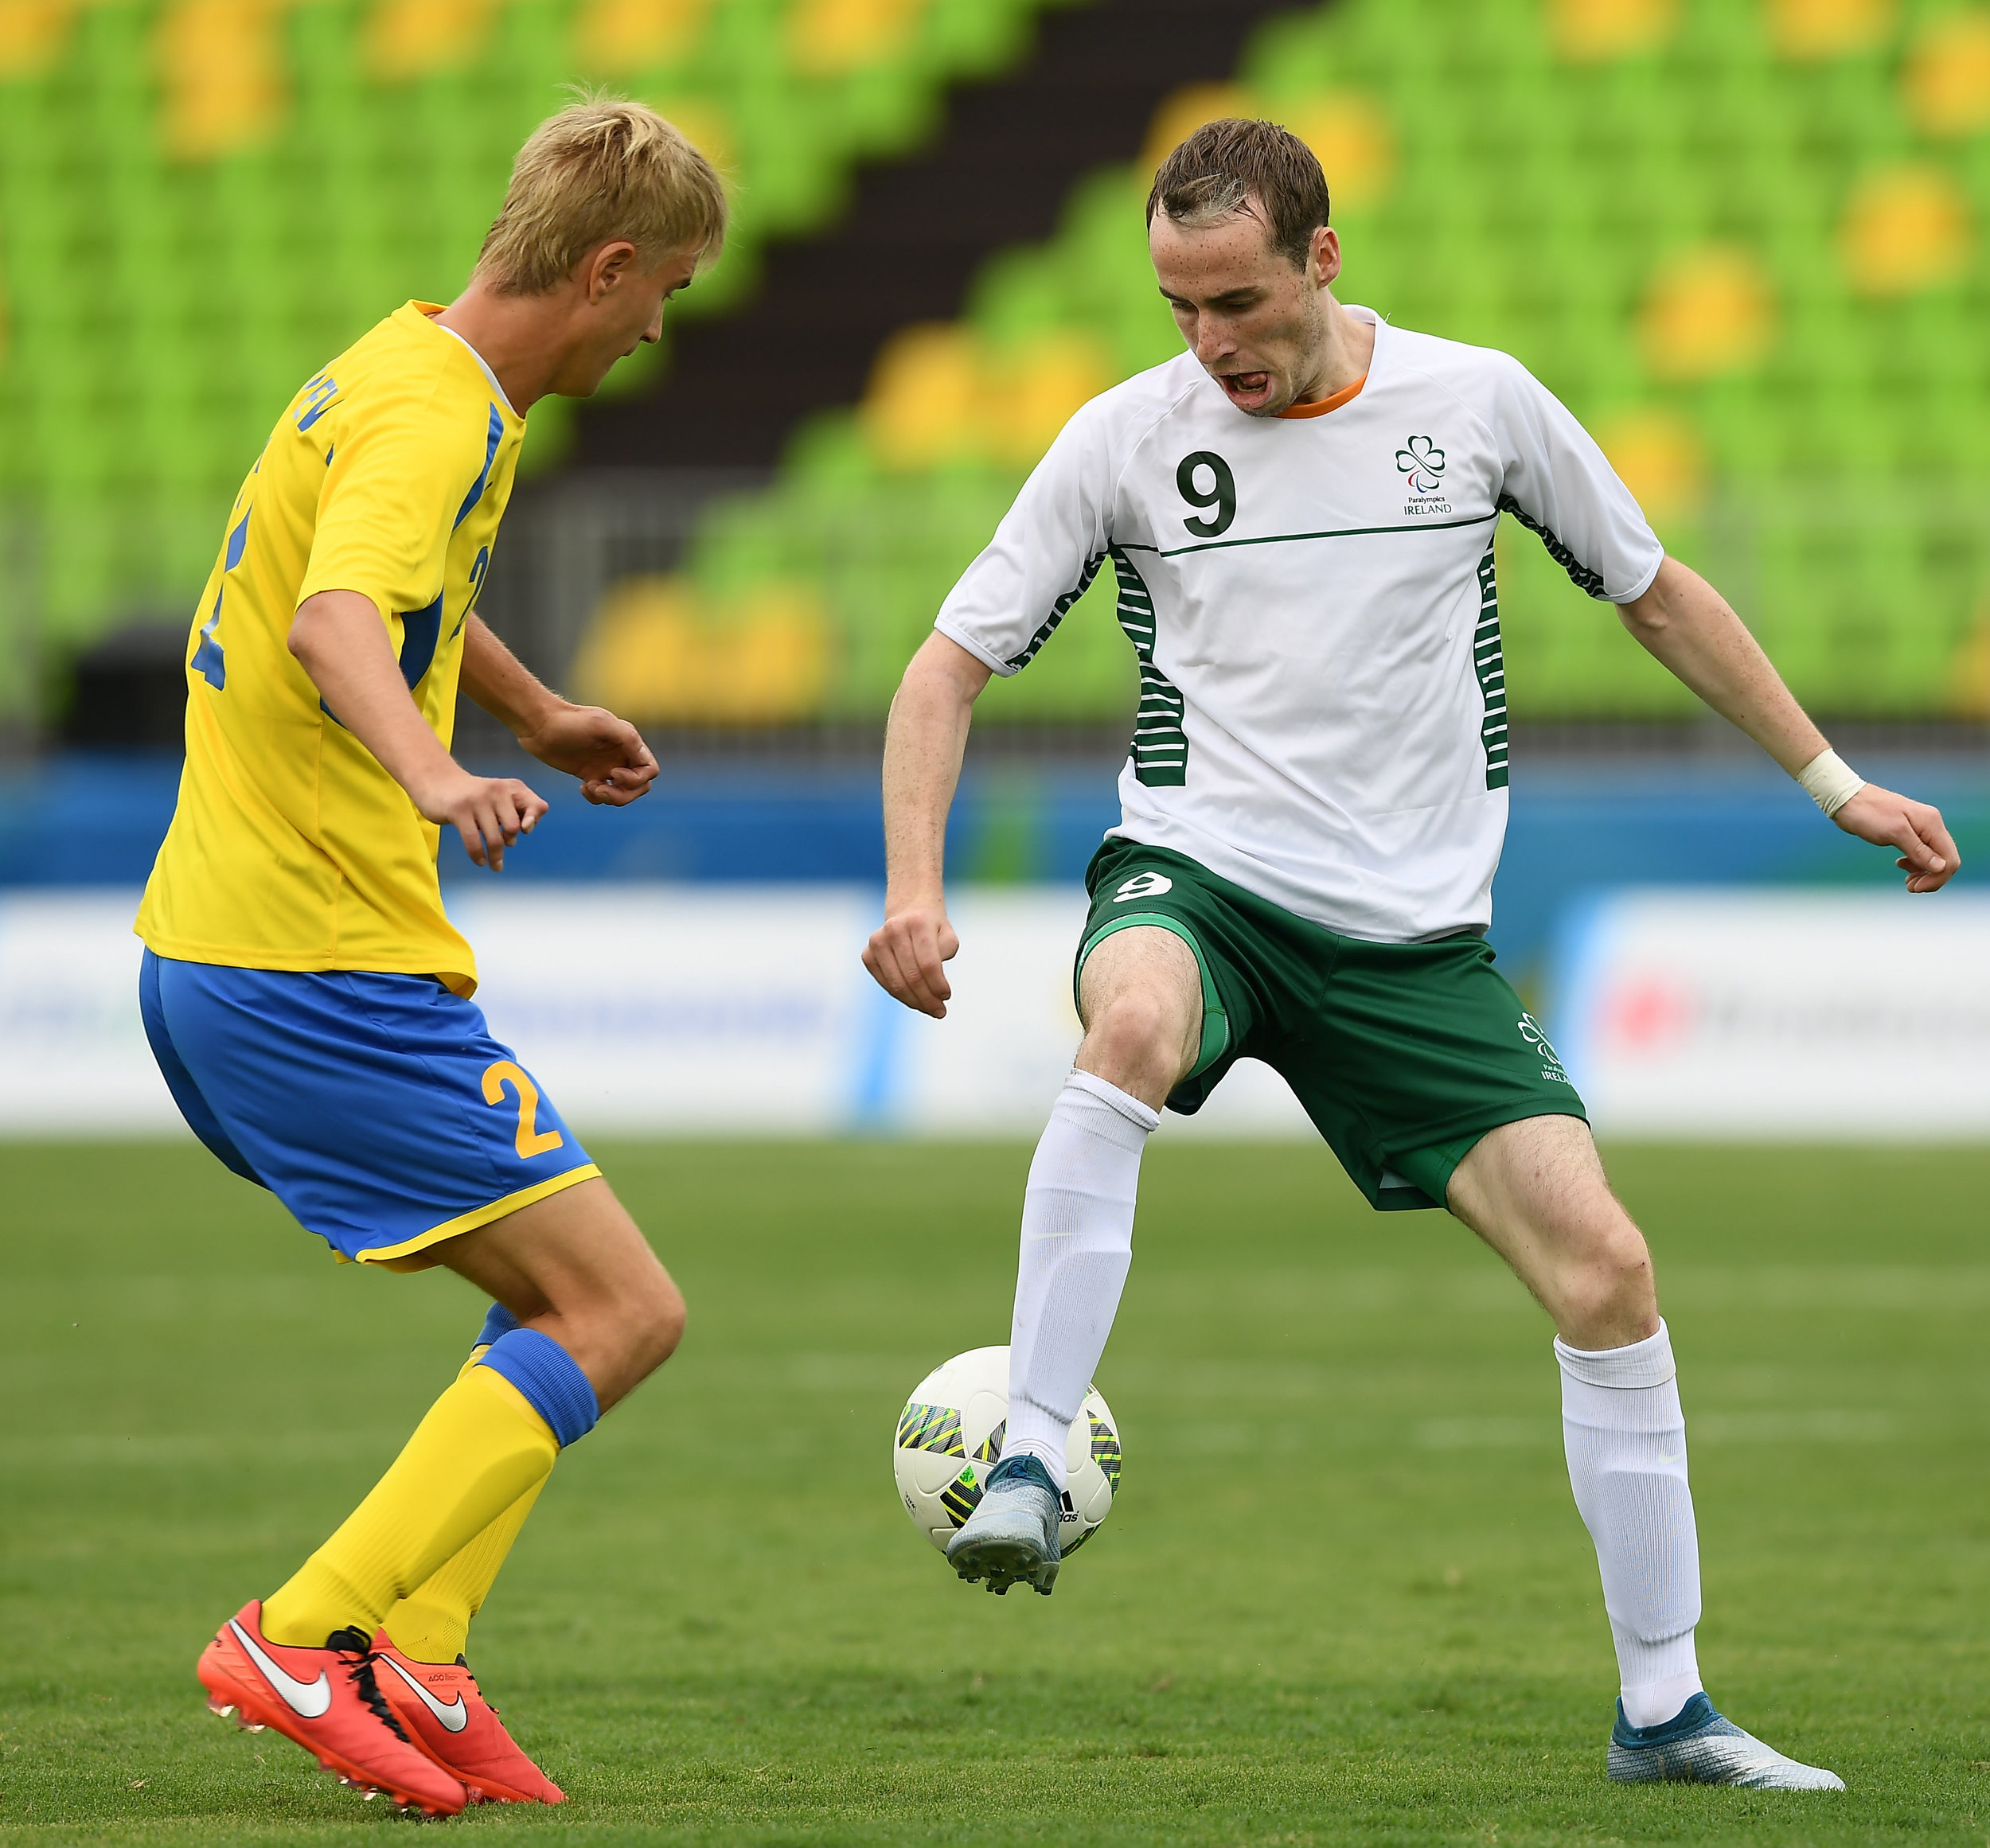 Football: Ireland's Ryan Nolan during match against Ukraine